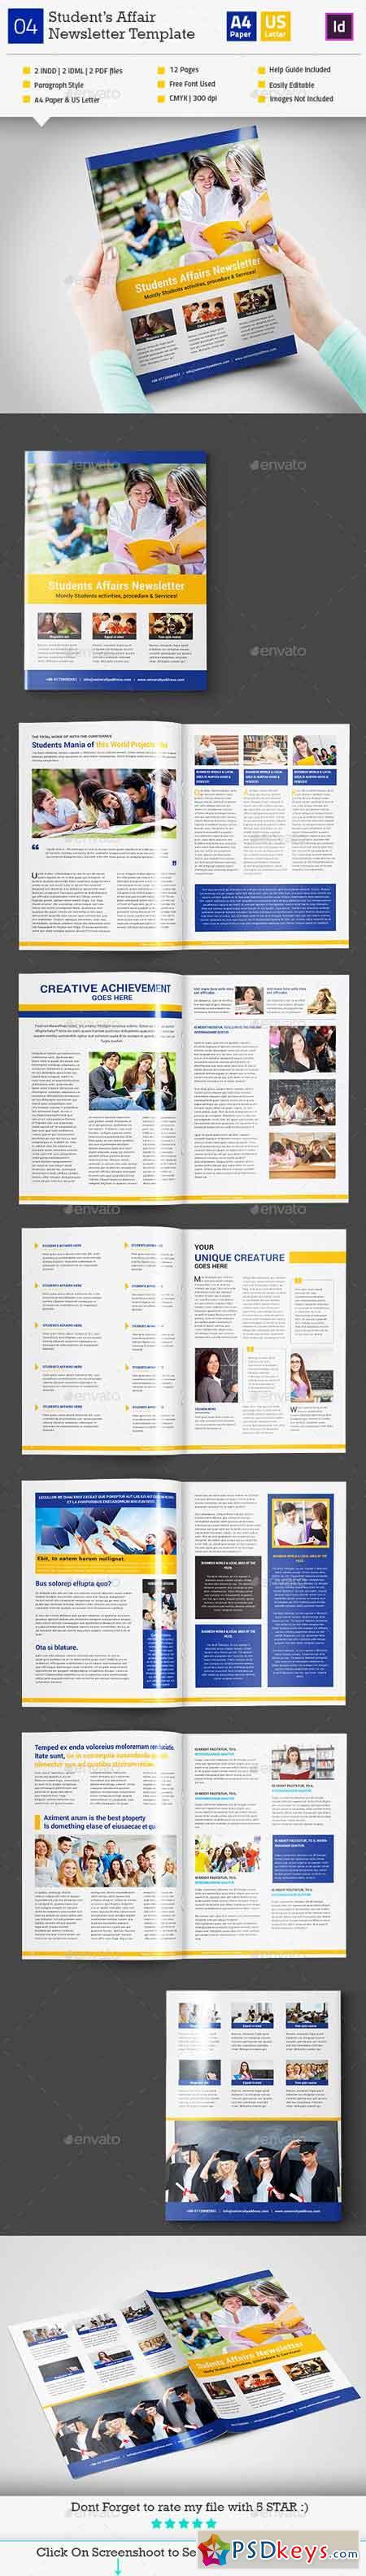 Student's Affair Newsletter Template_InDesign_V4 11031909